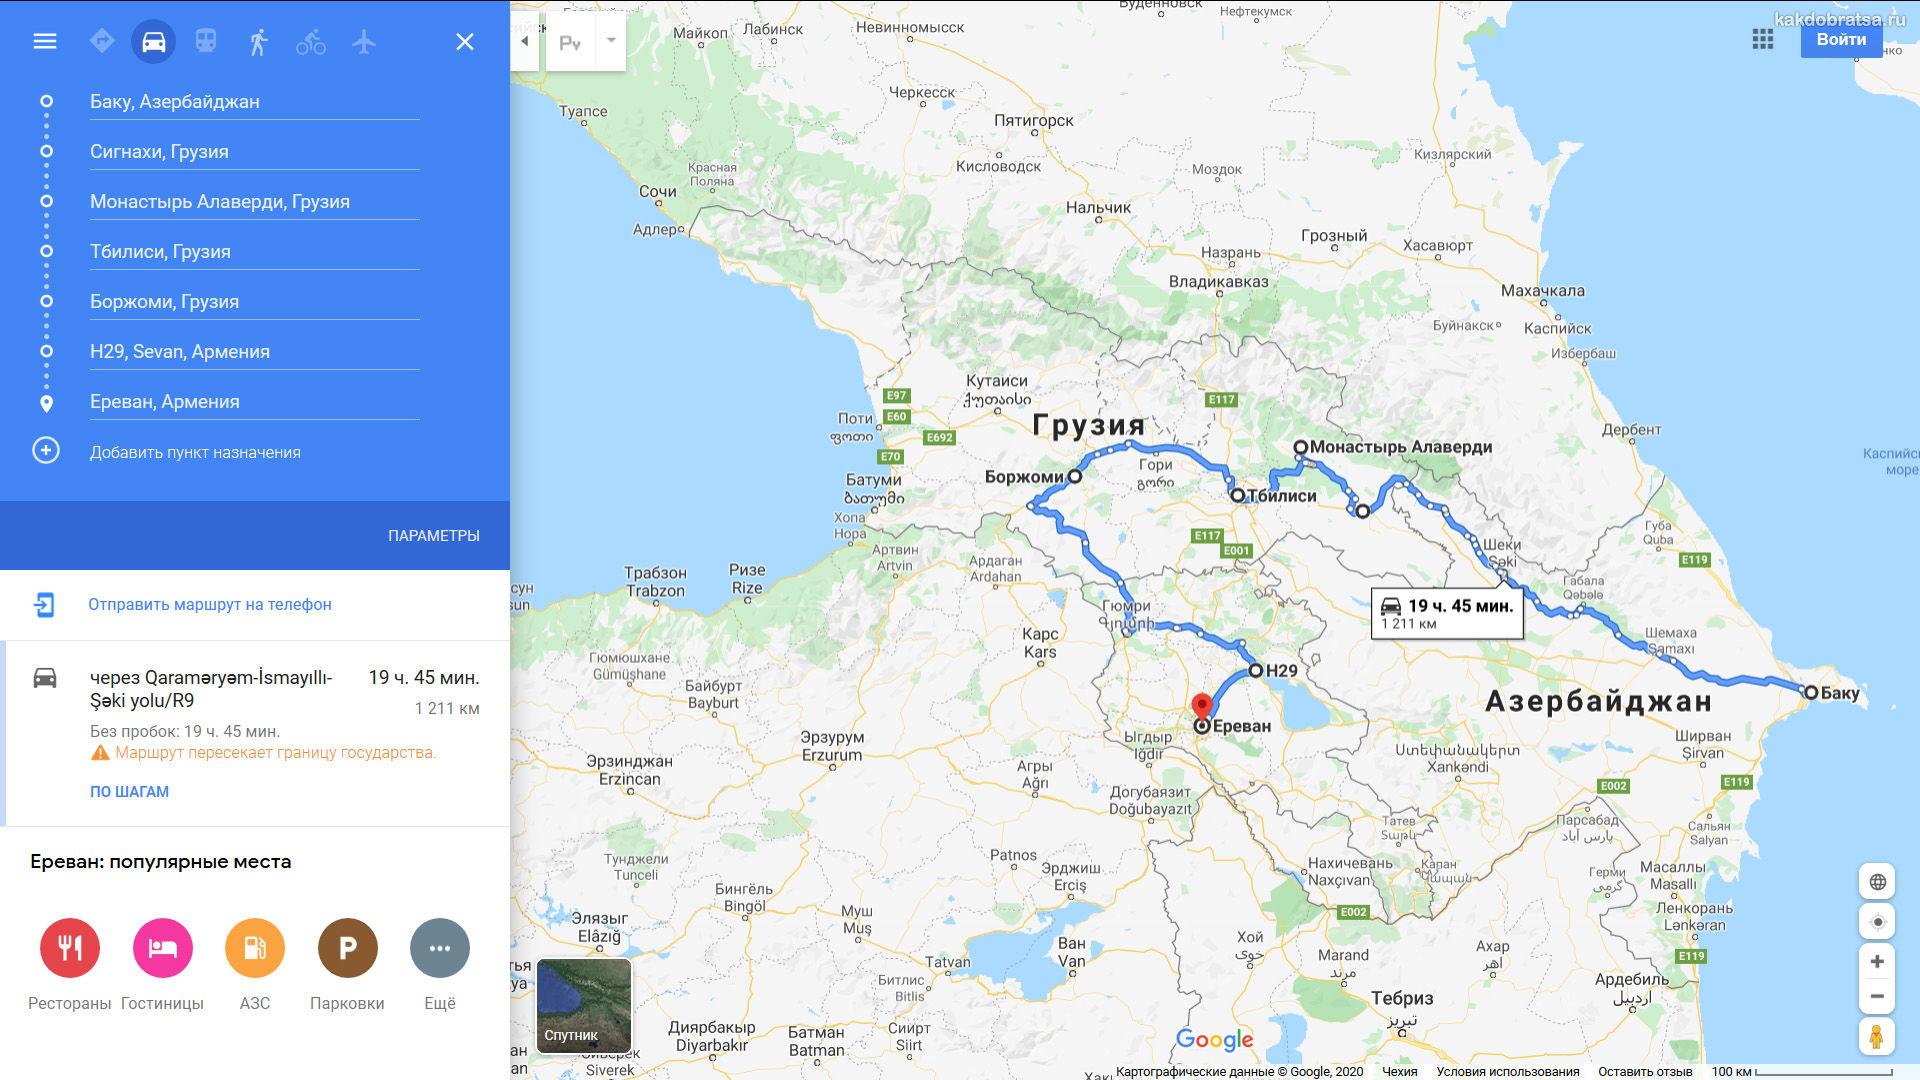 Карта маршрута путешествия по Закавказью Азербайджан, Грузия и Армения